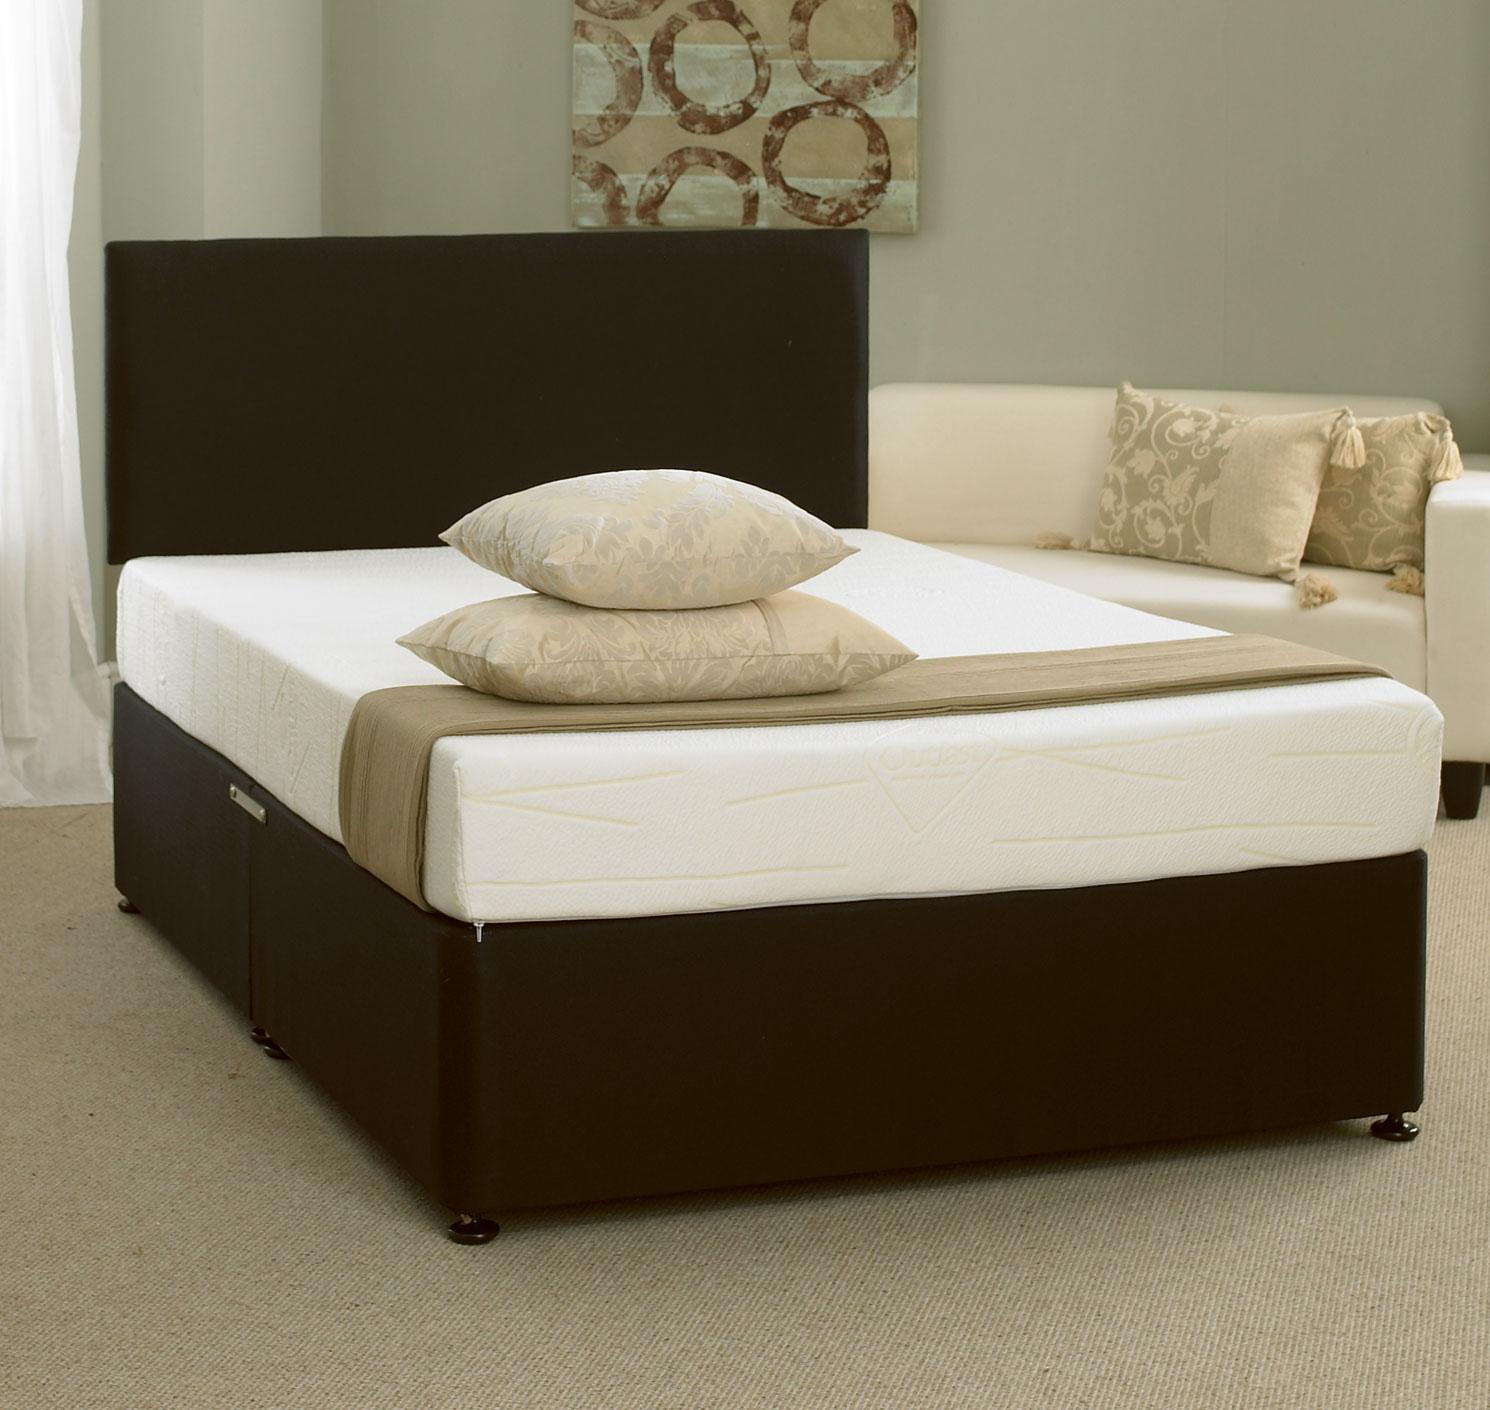 limelight triton sofa bed beige chair brisbane tempo mattress